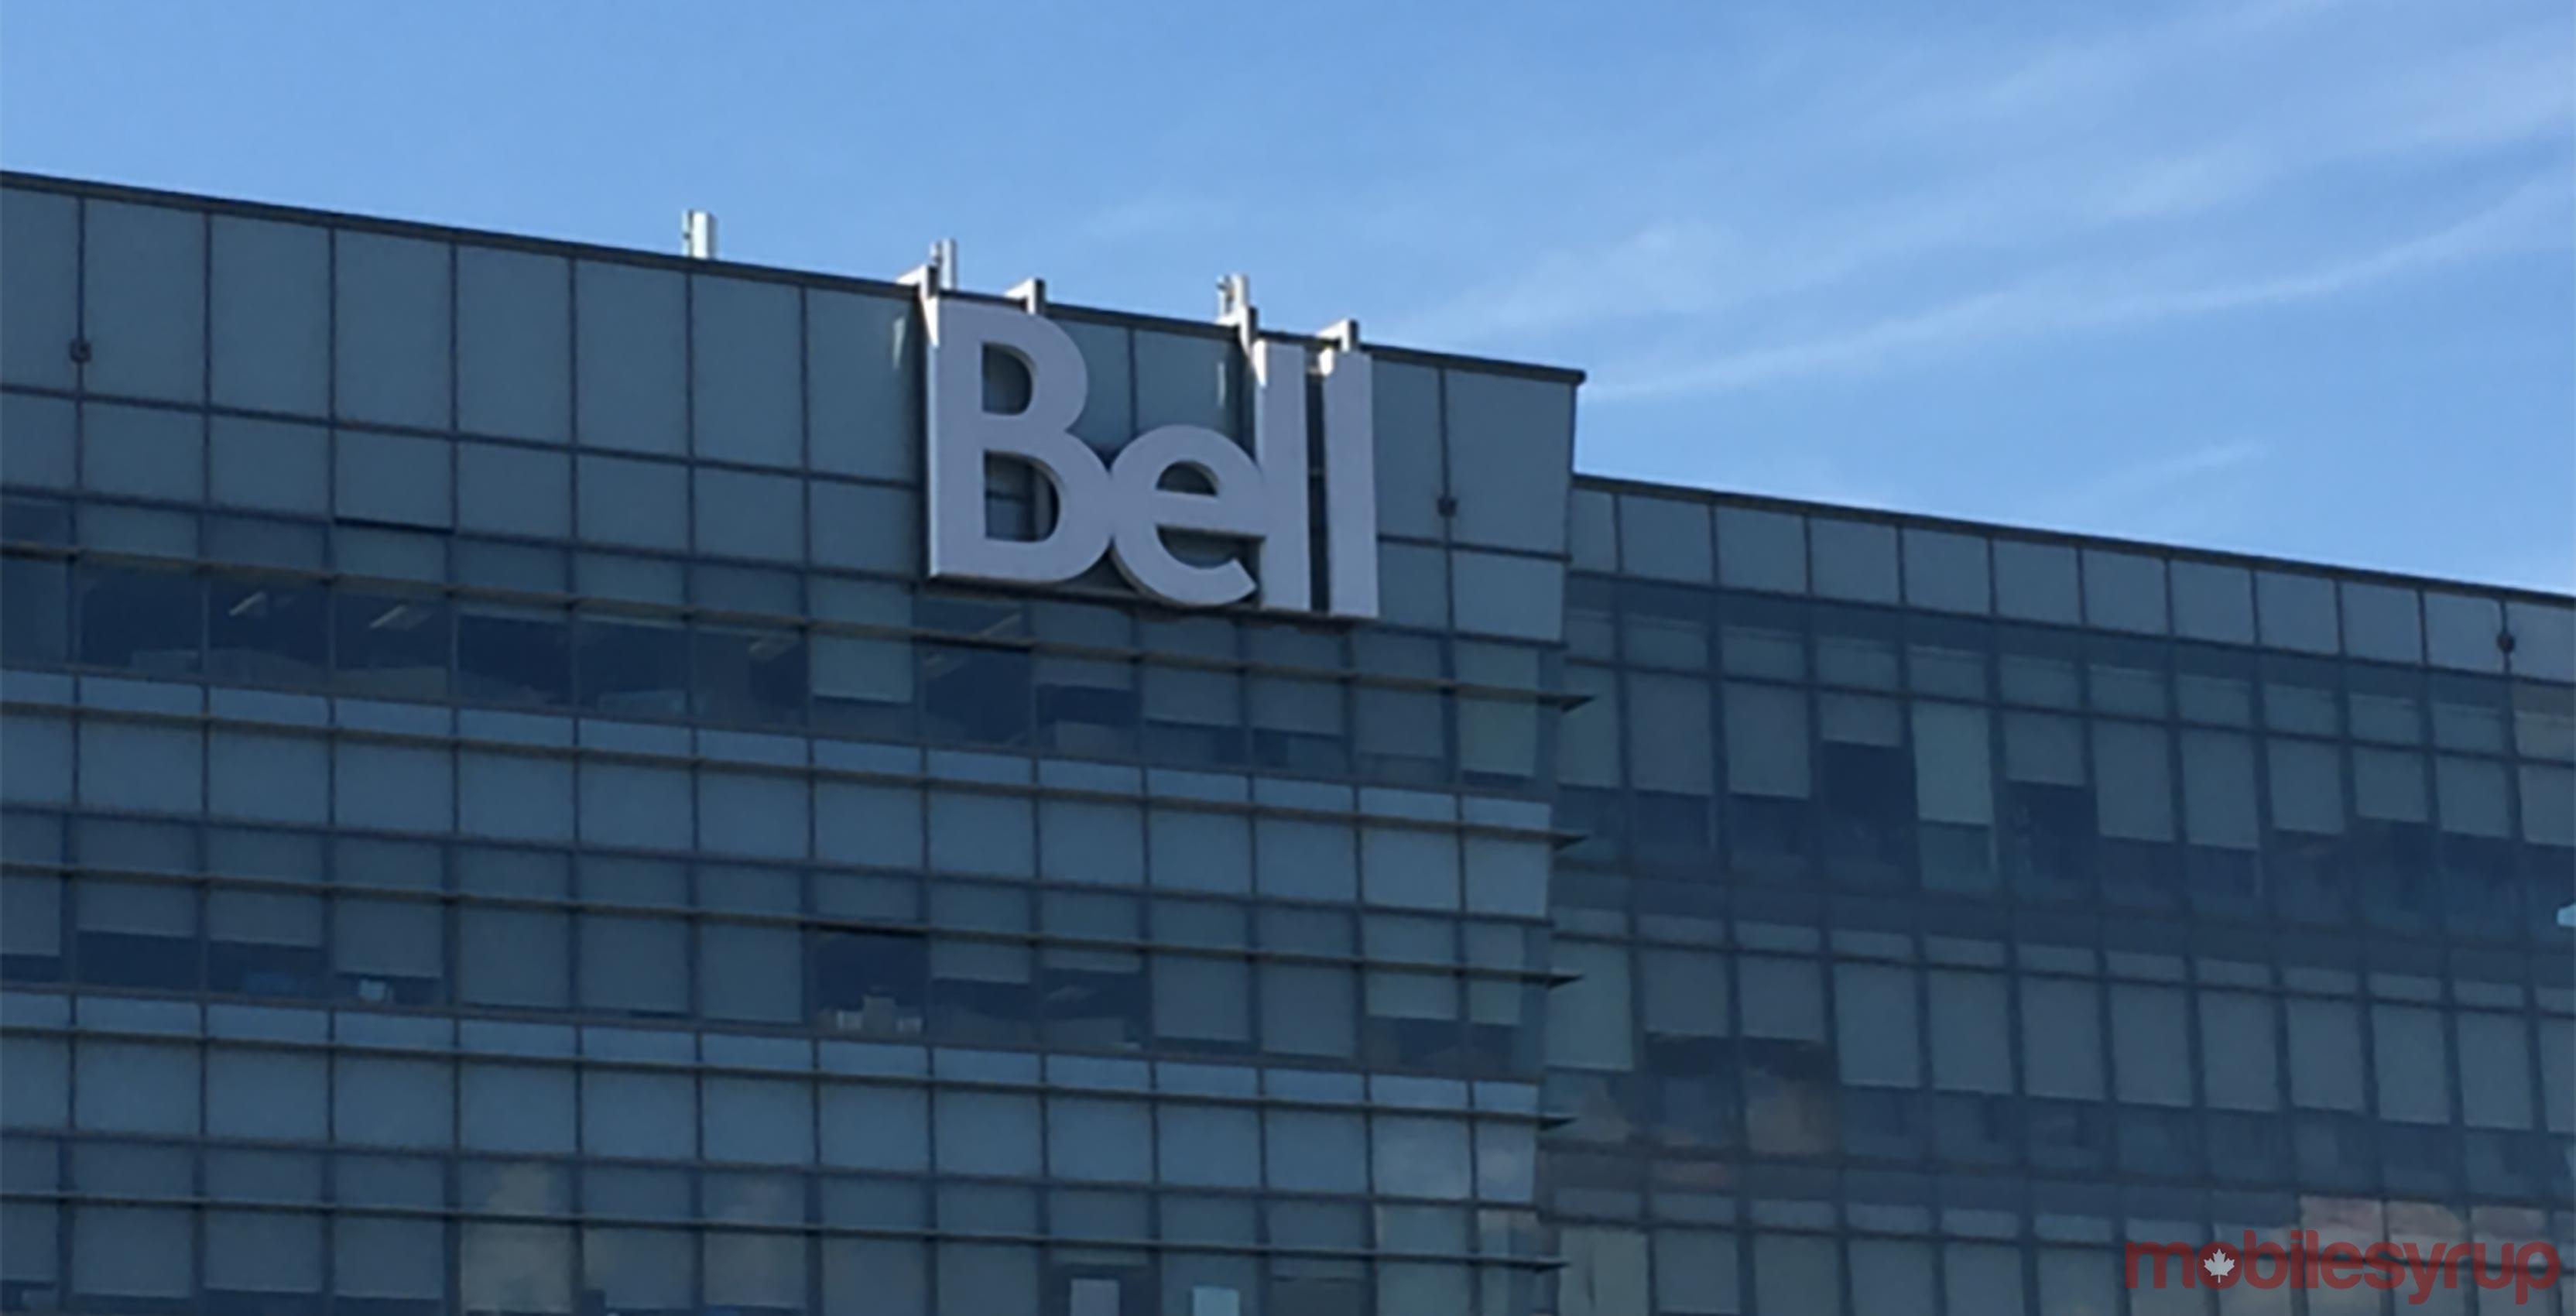 Bell logo on building